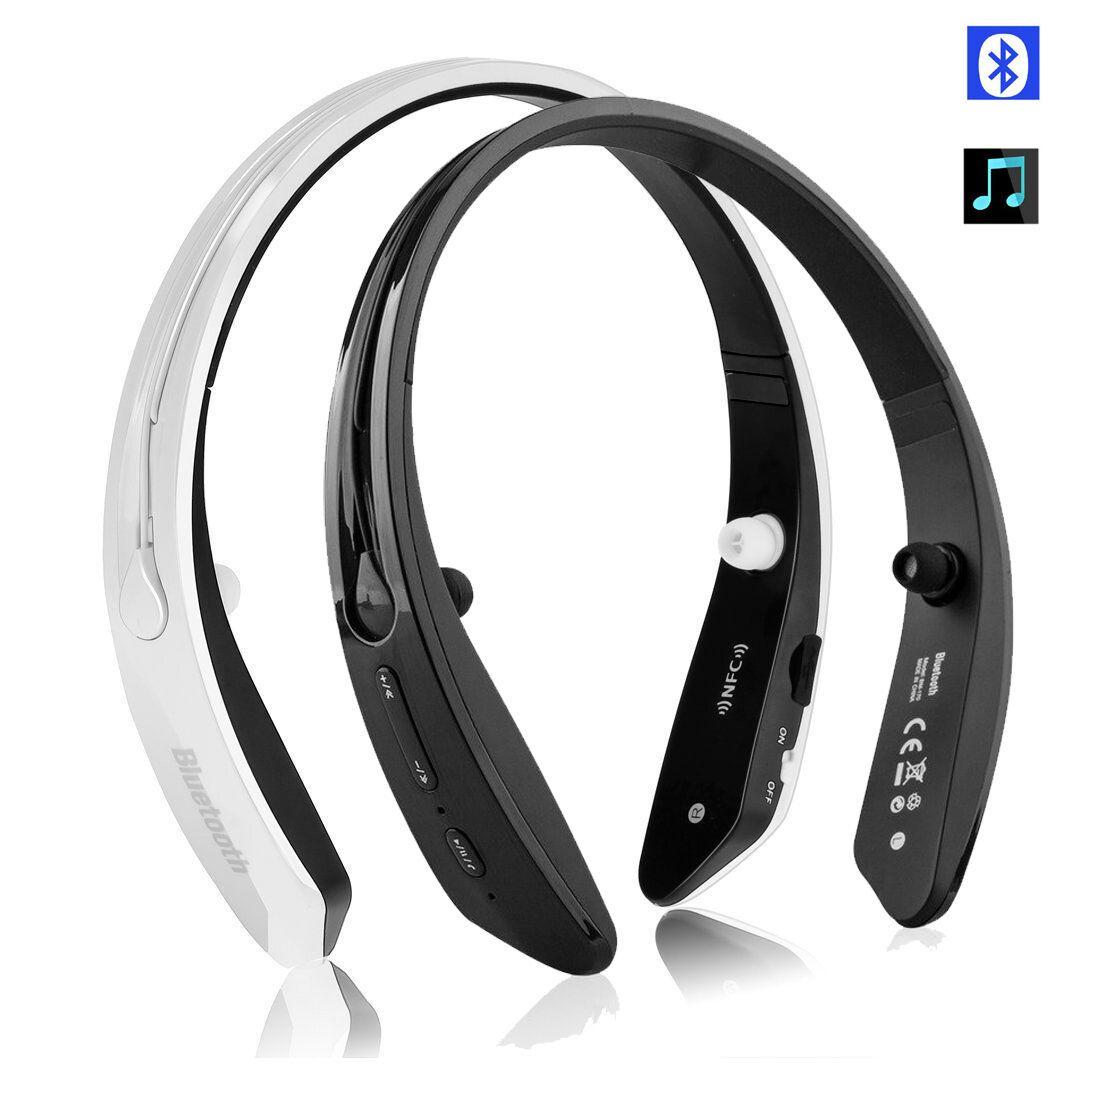 Running Earbuds Bluetooth Headsets Headphones For Iphone Samsung Vivo Huawei Headphones For In 2020 Running Headphones Running Earbuds Bluetooth Headset Headphones